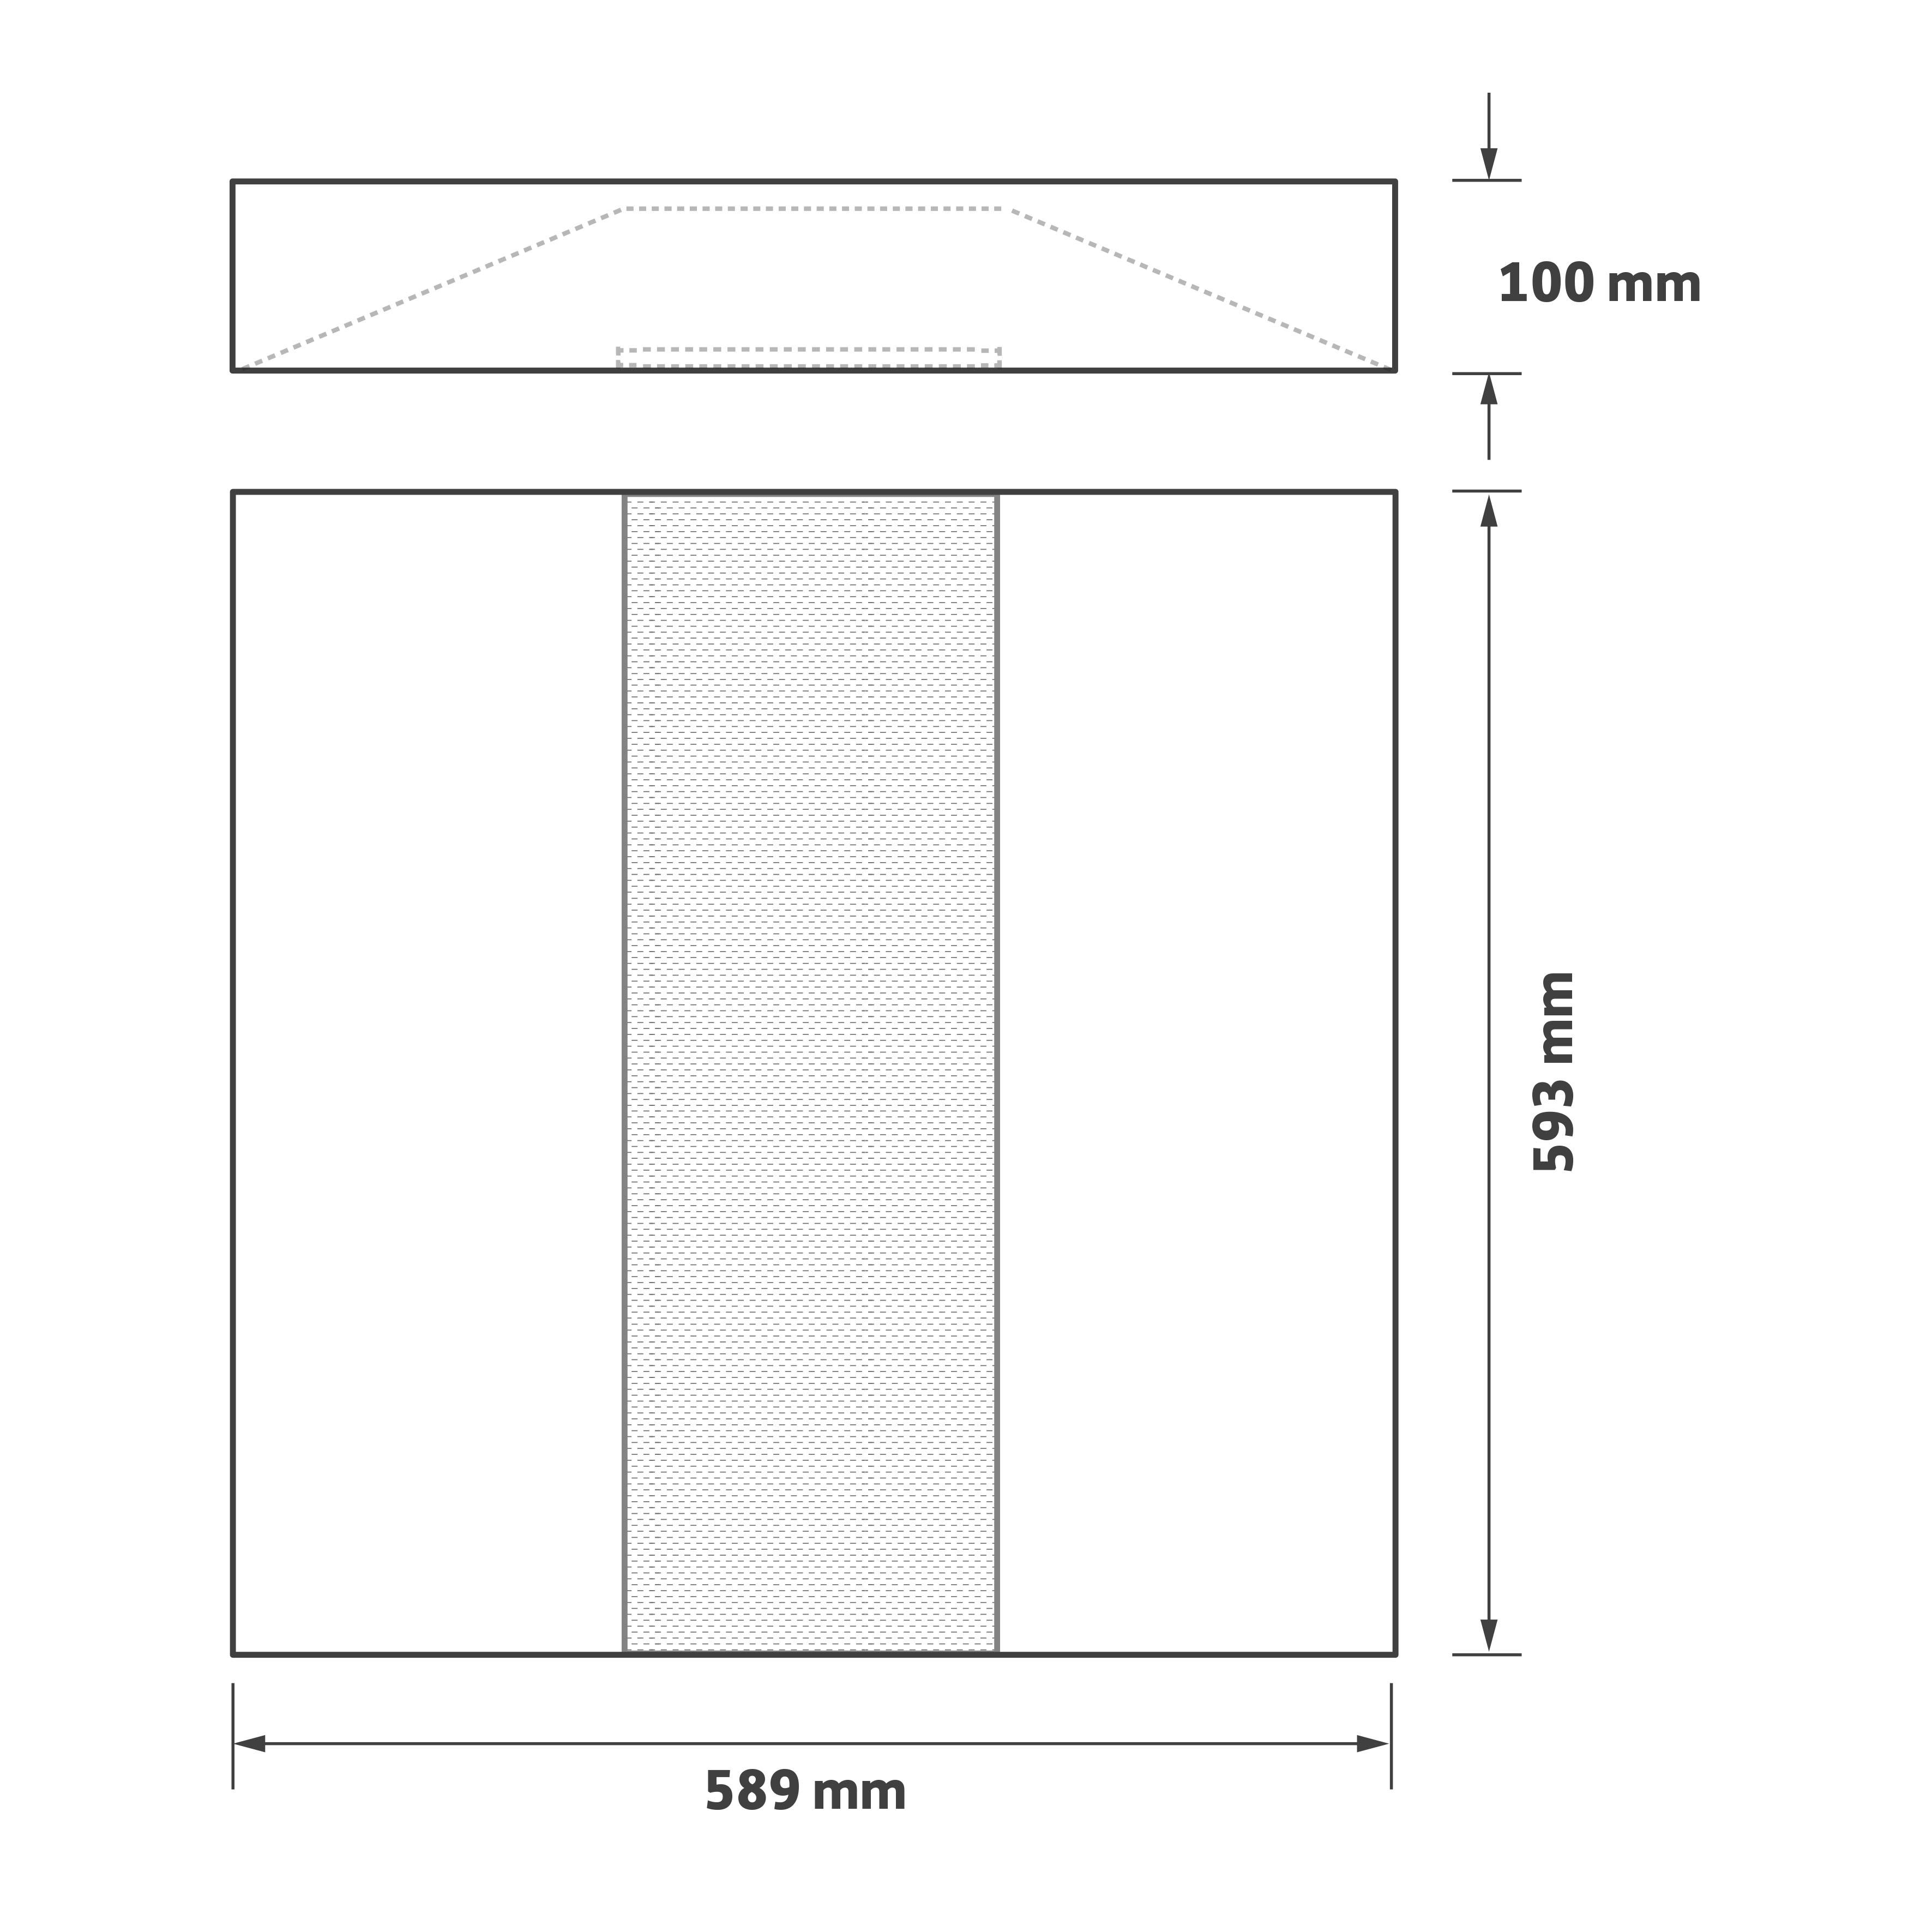 Quadrato_Dimensions.jpg